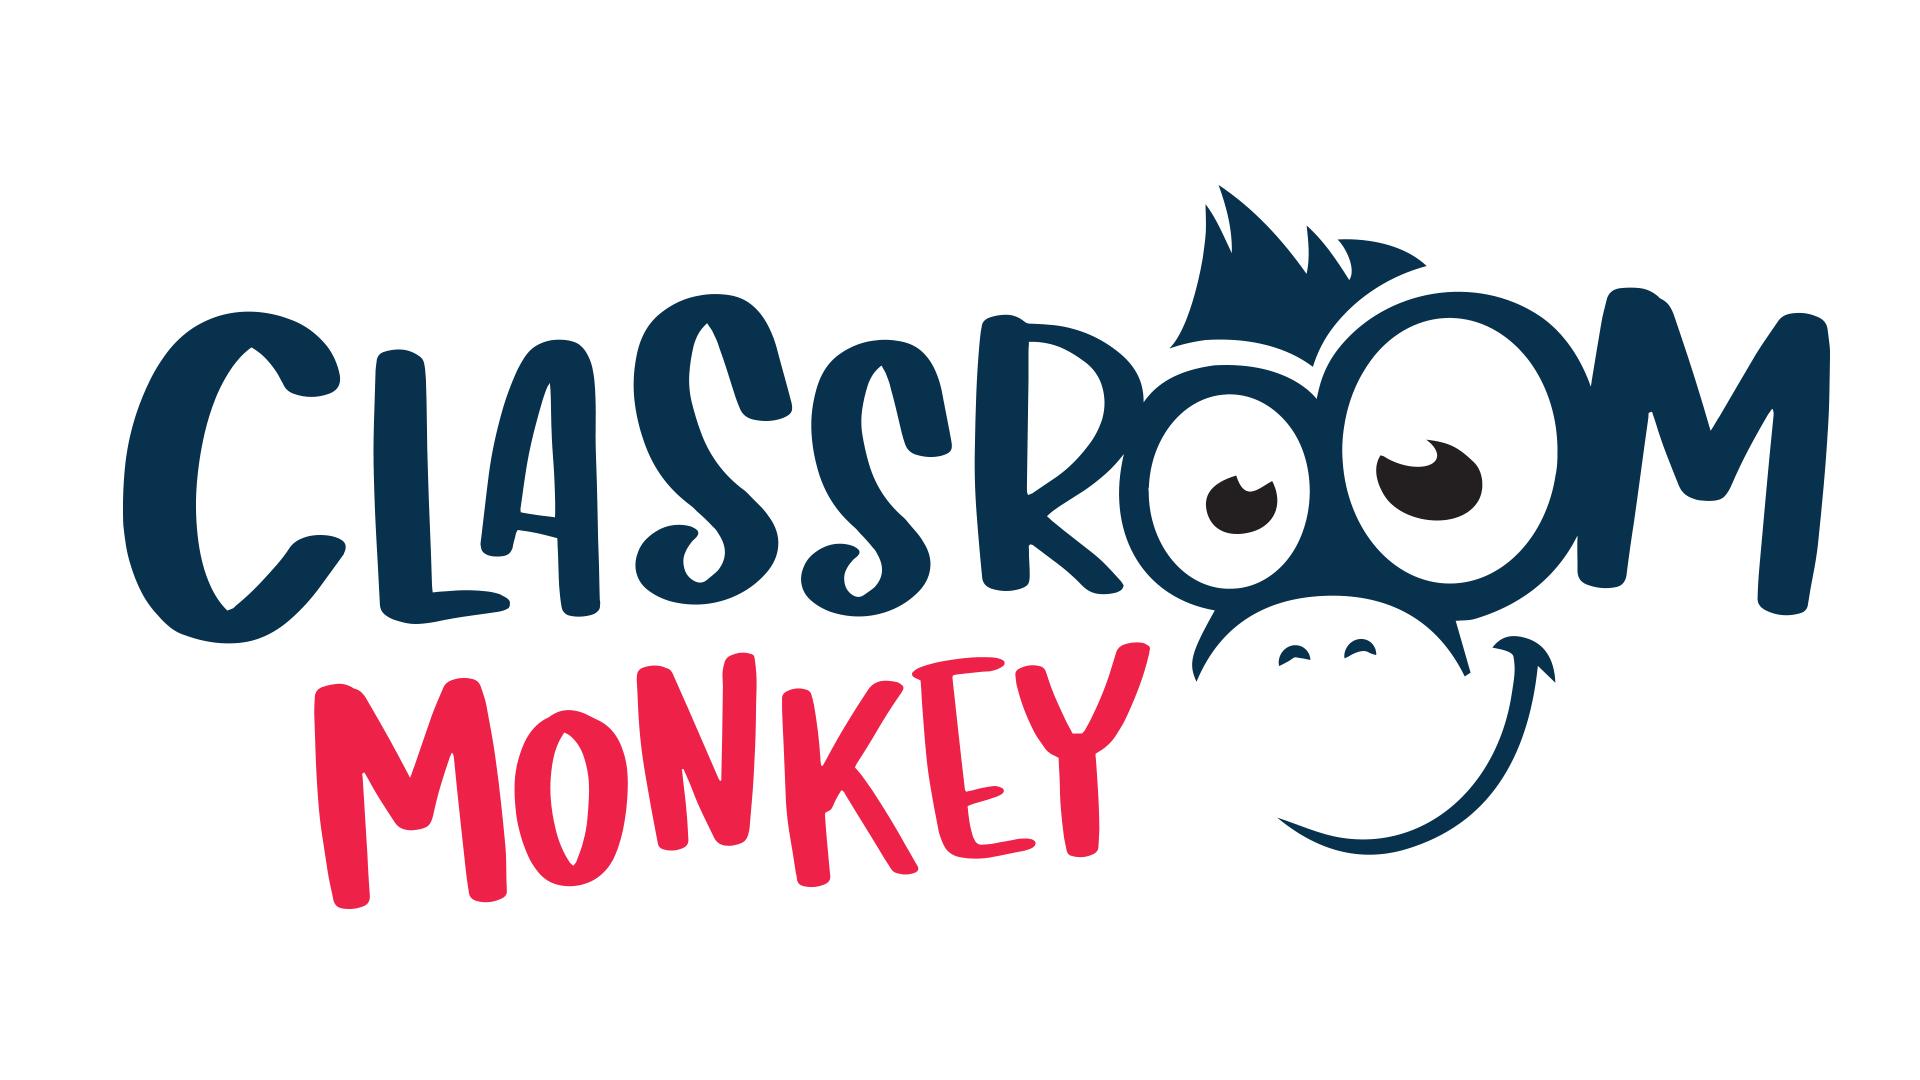 Classroom Monkey Logo